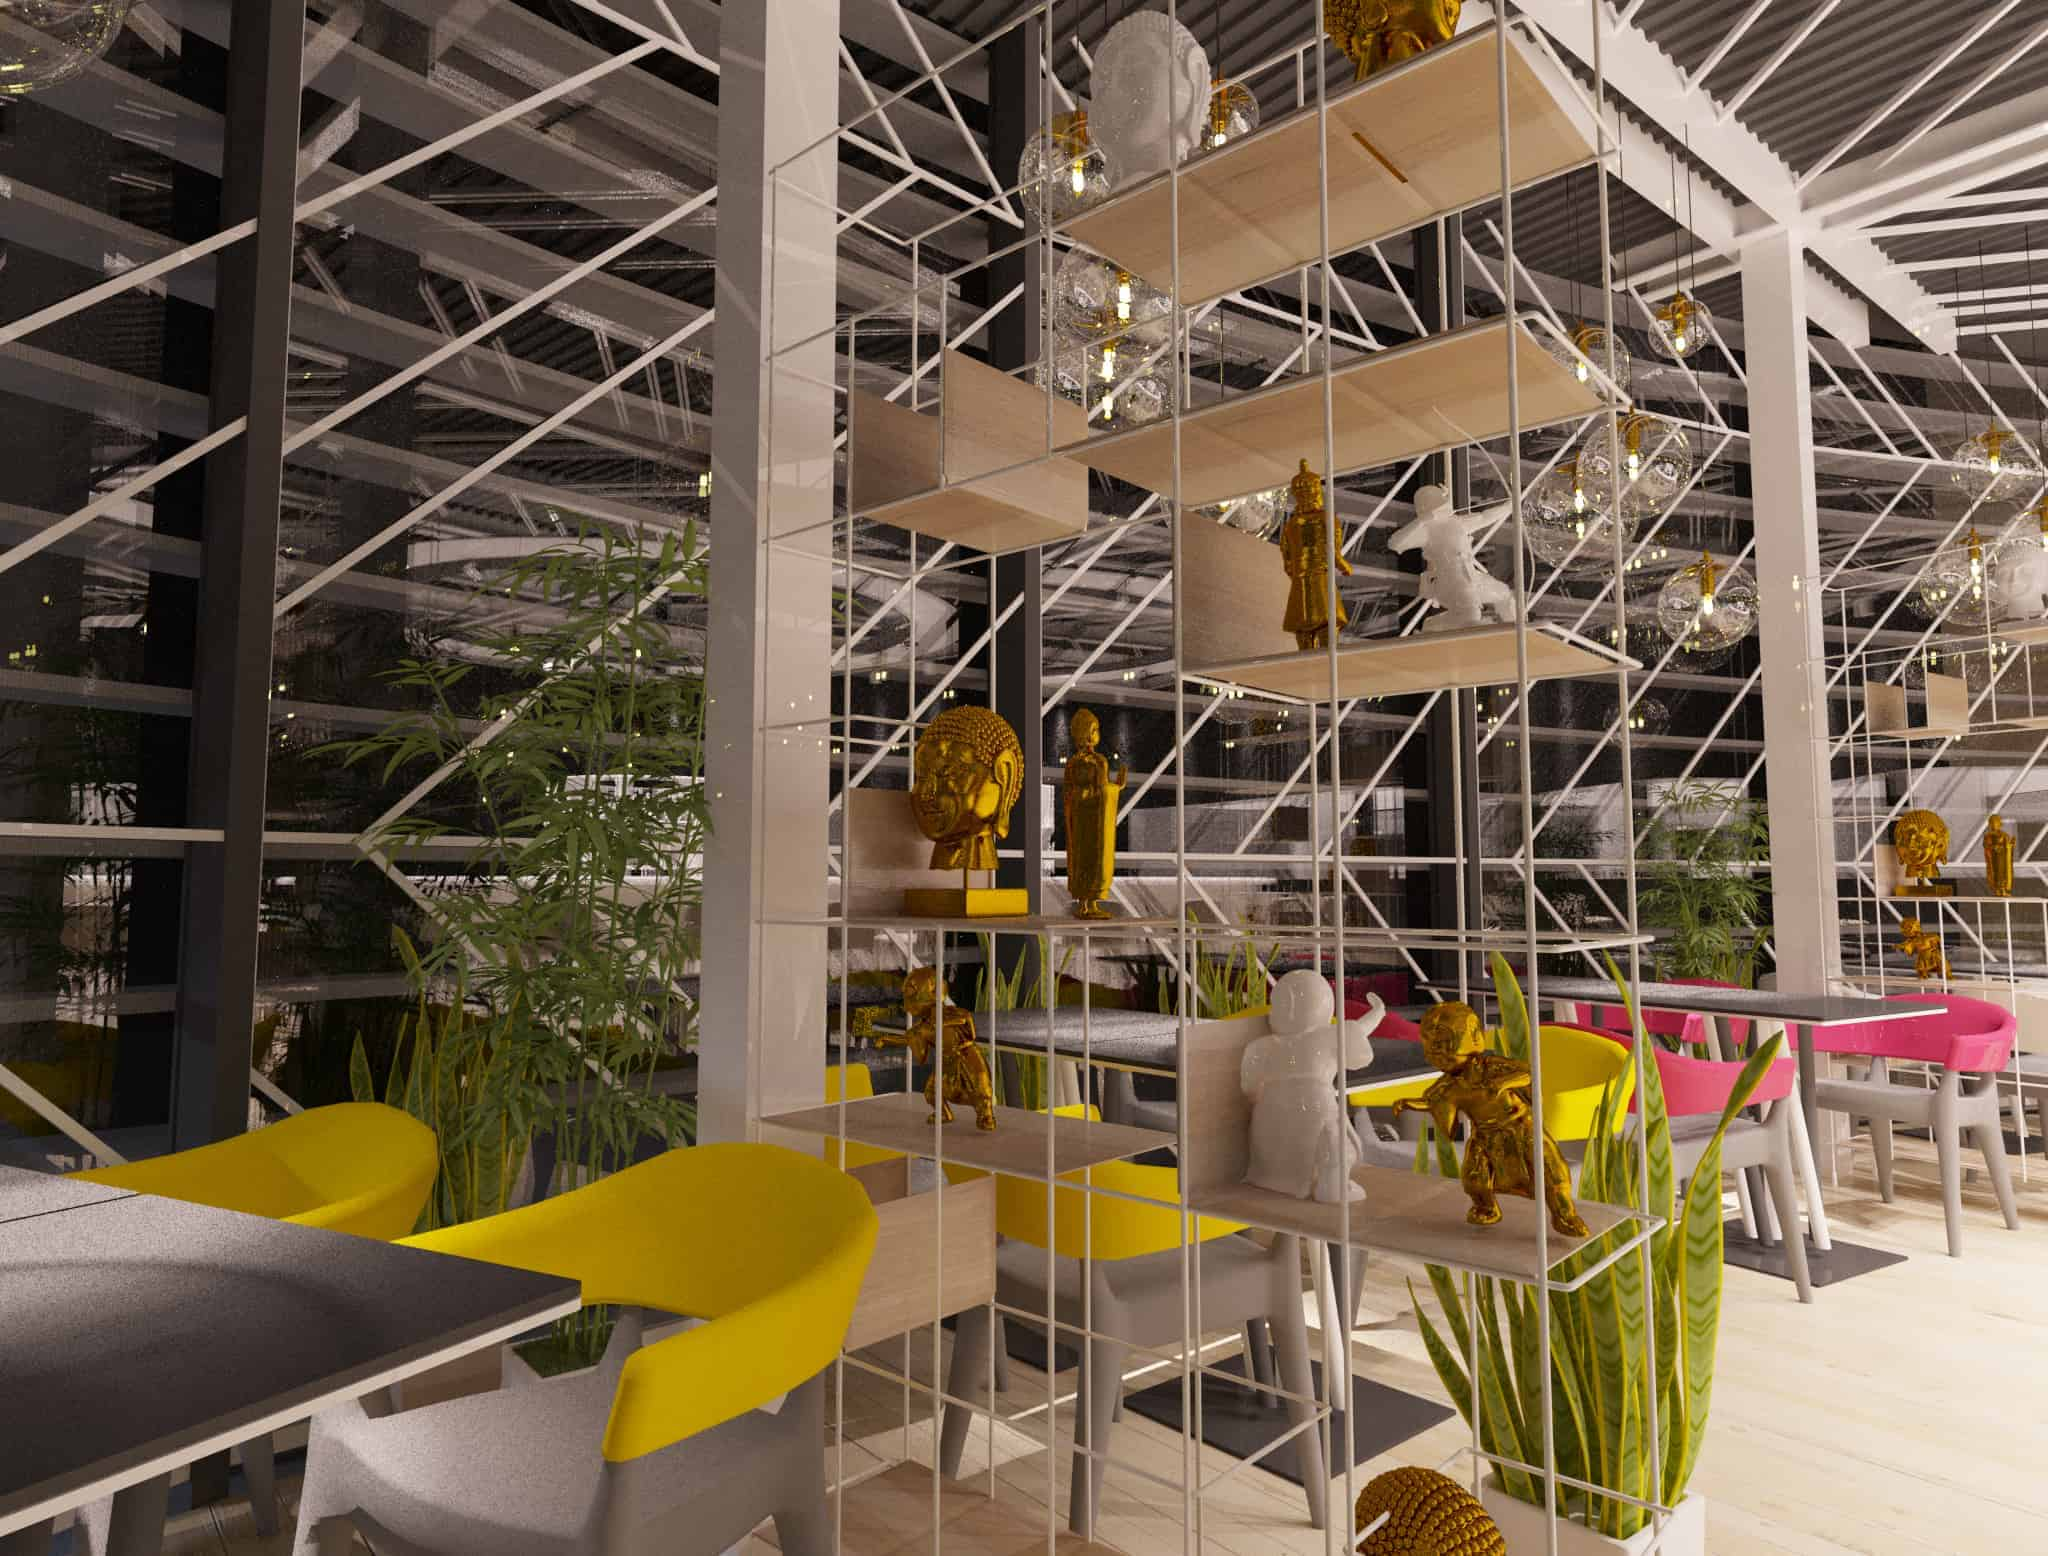 pan-asian restaurant - design ideas